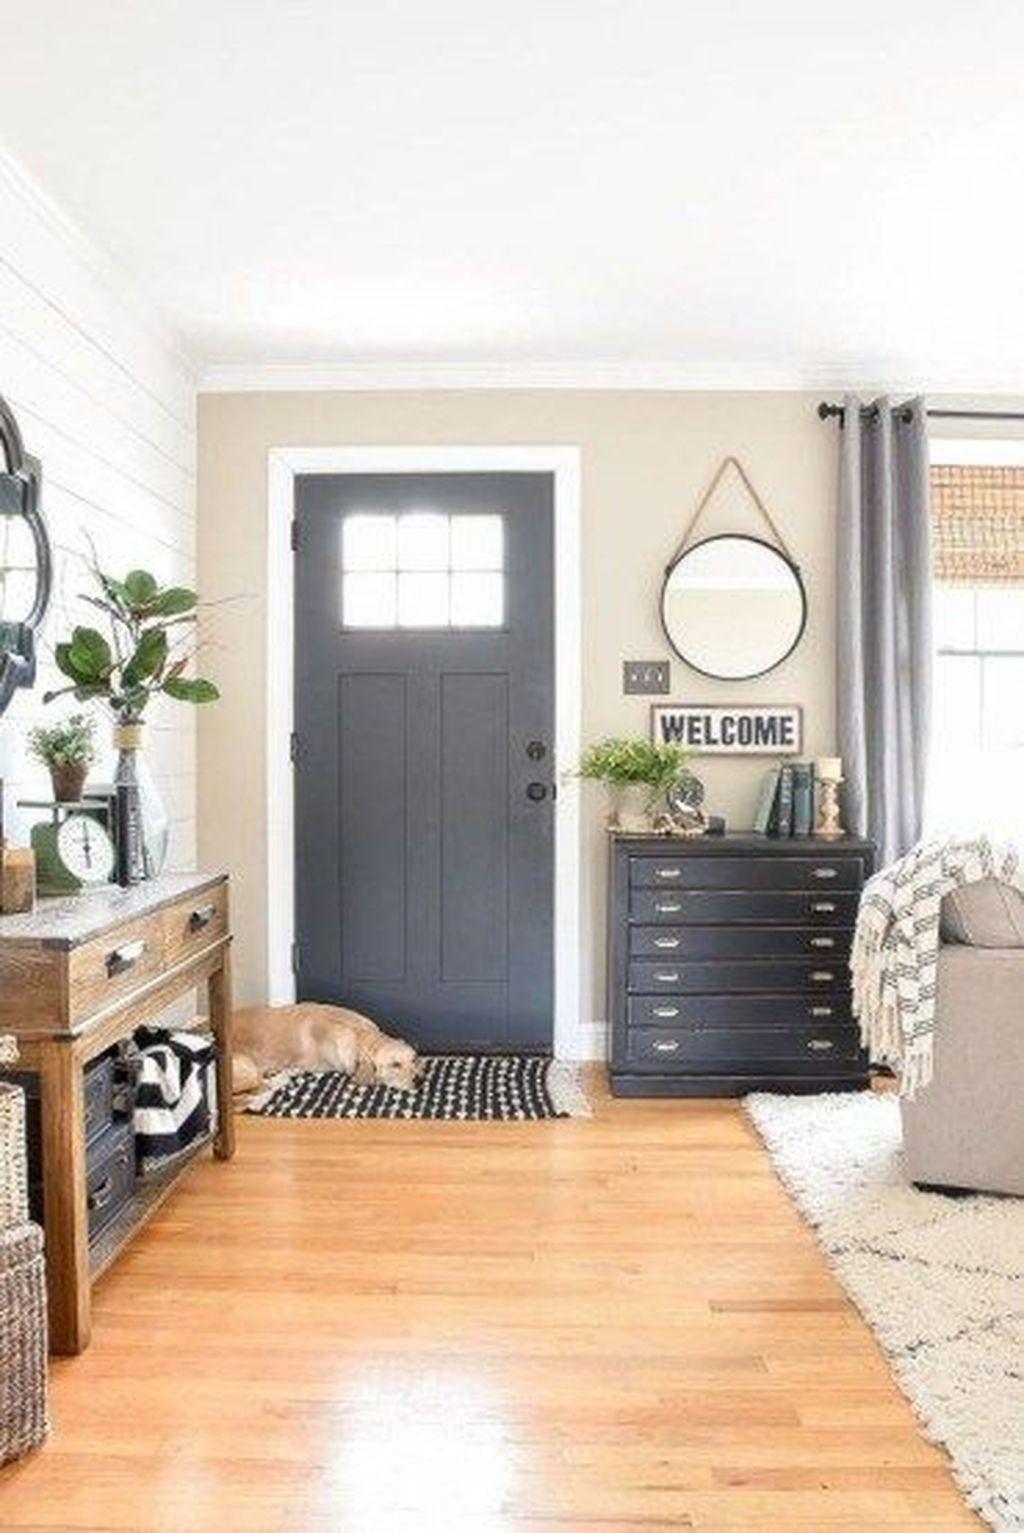 50 Luxury Modern Farmhouse Decoration Ideas - HOMYHOMEE